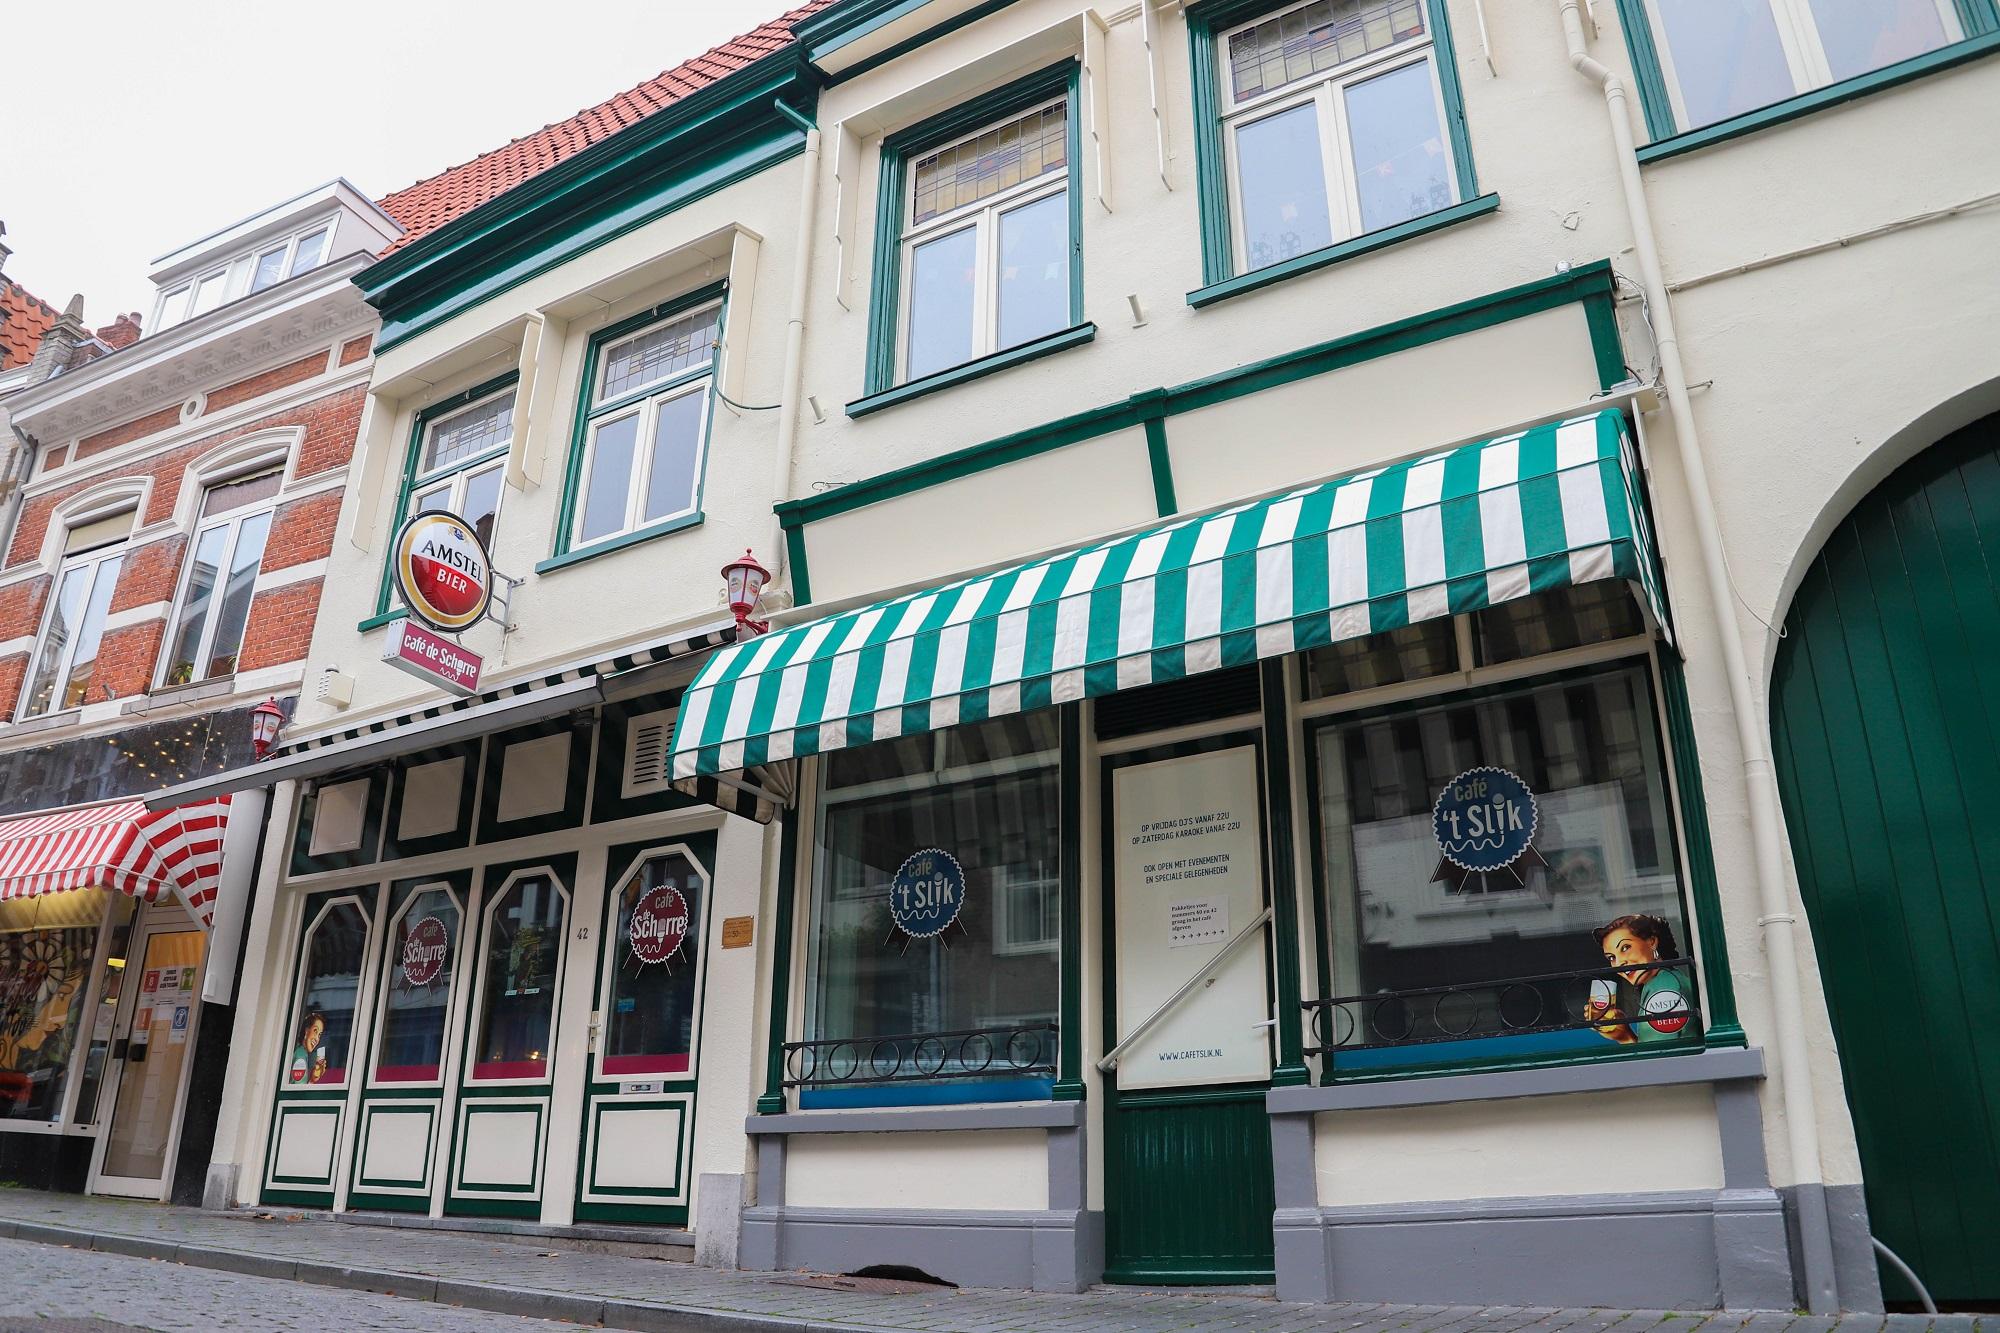 cafe café kroeg steenbergsestraat 't slik het slik